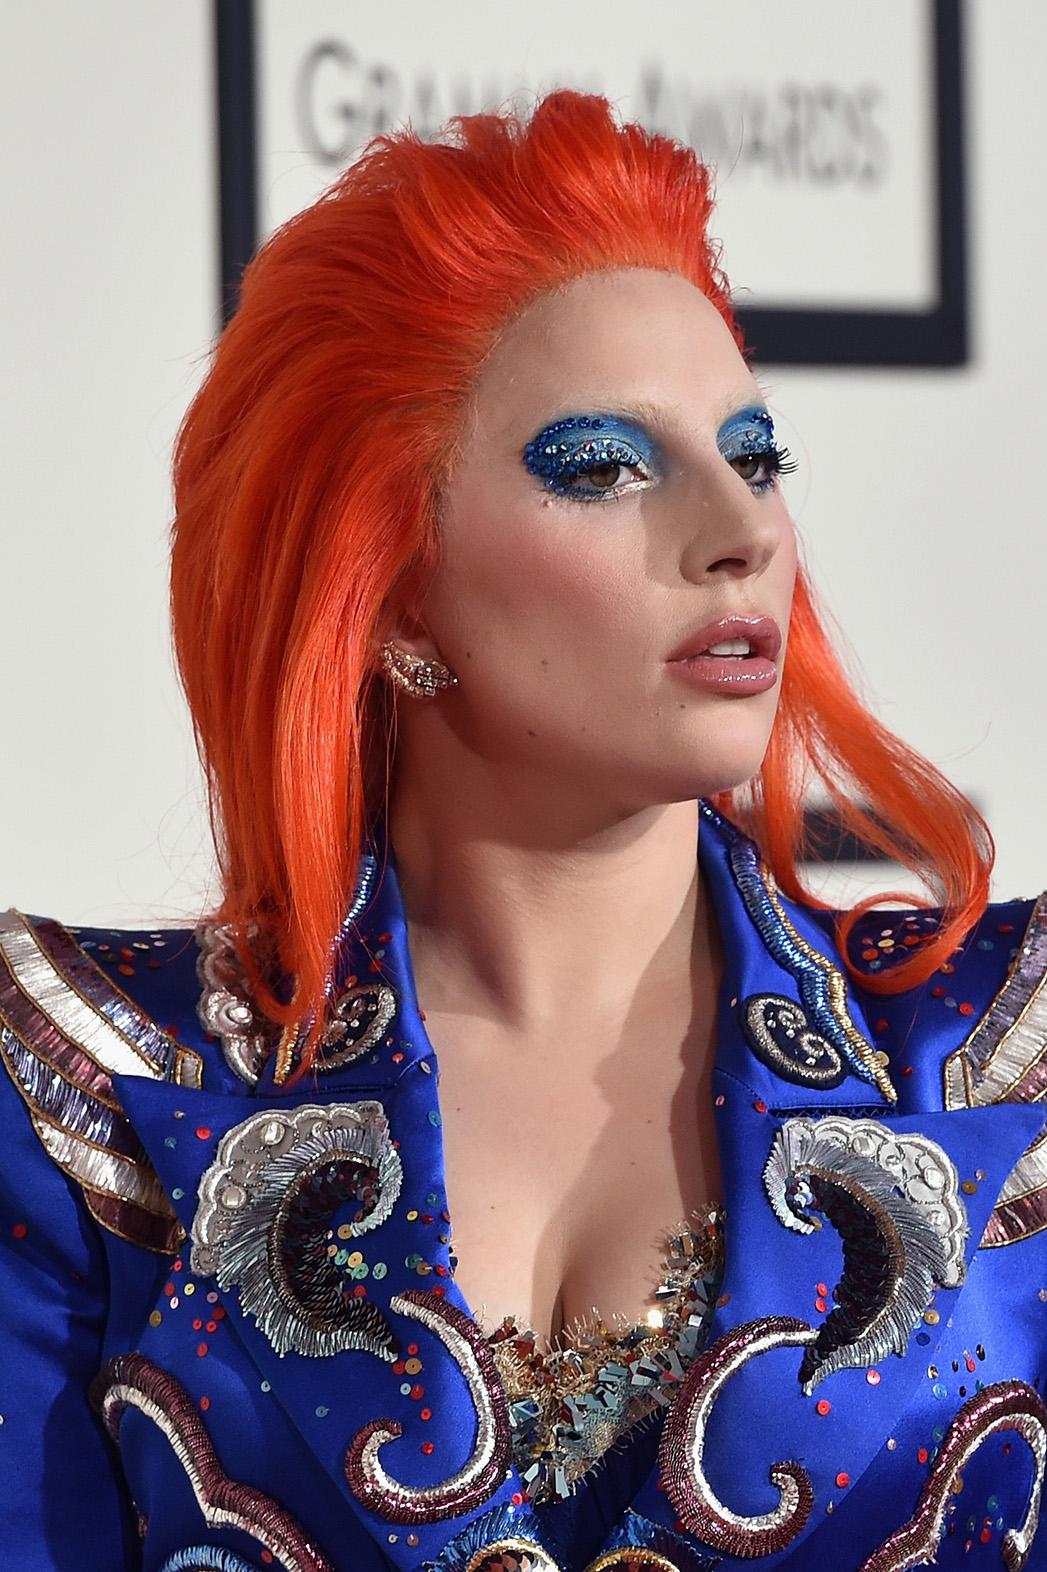 Lady Gaga - p 2016